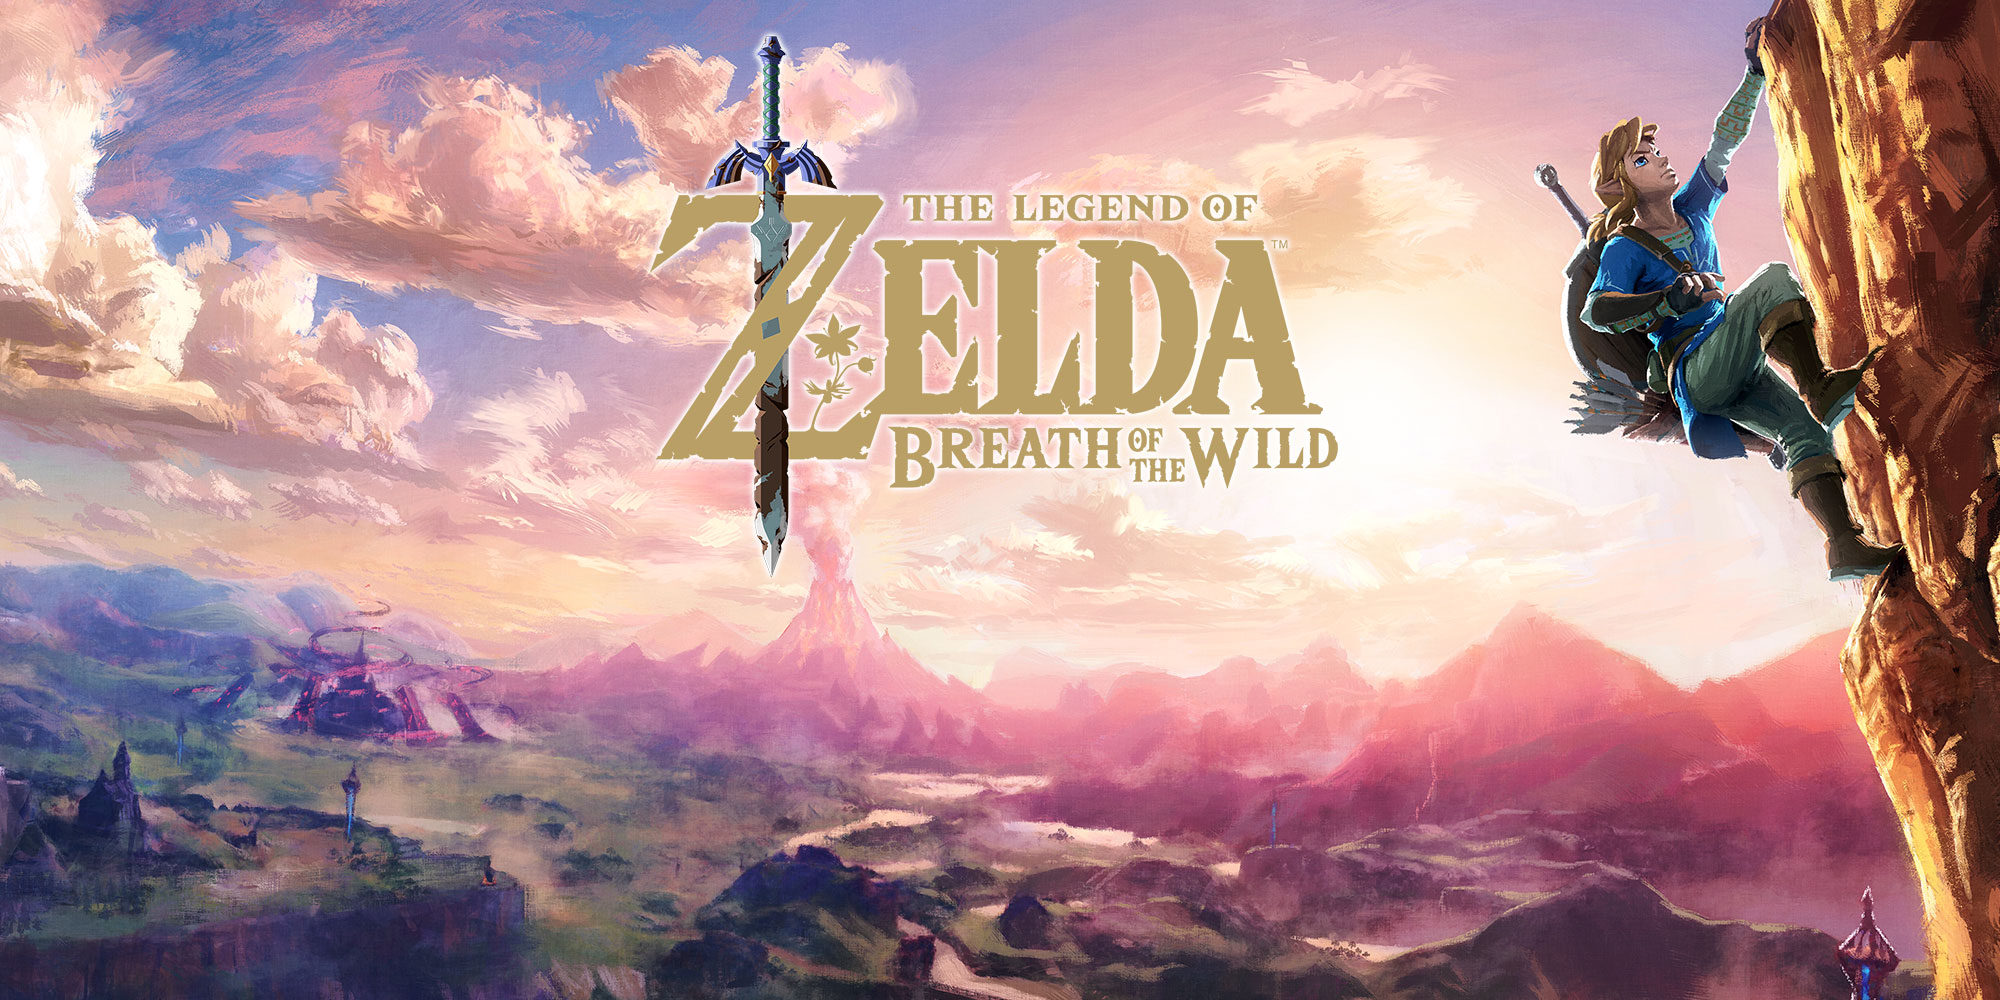 The-Legend-Of-Zelda-Breath-Of-The-Wild-nat-games